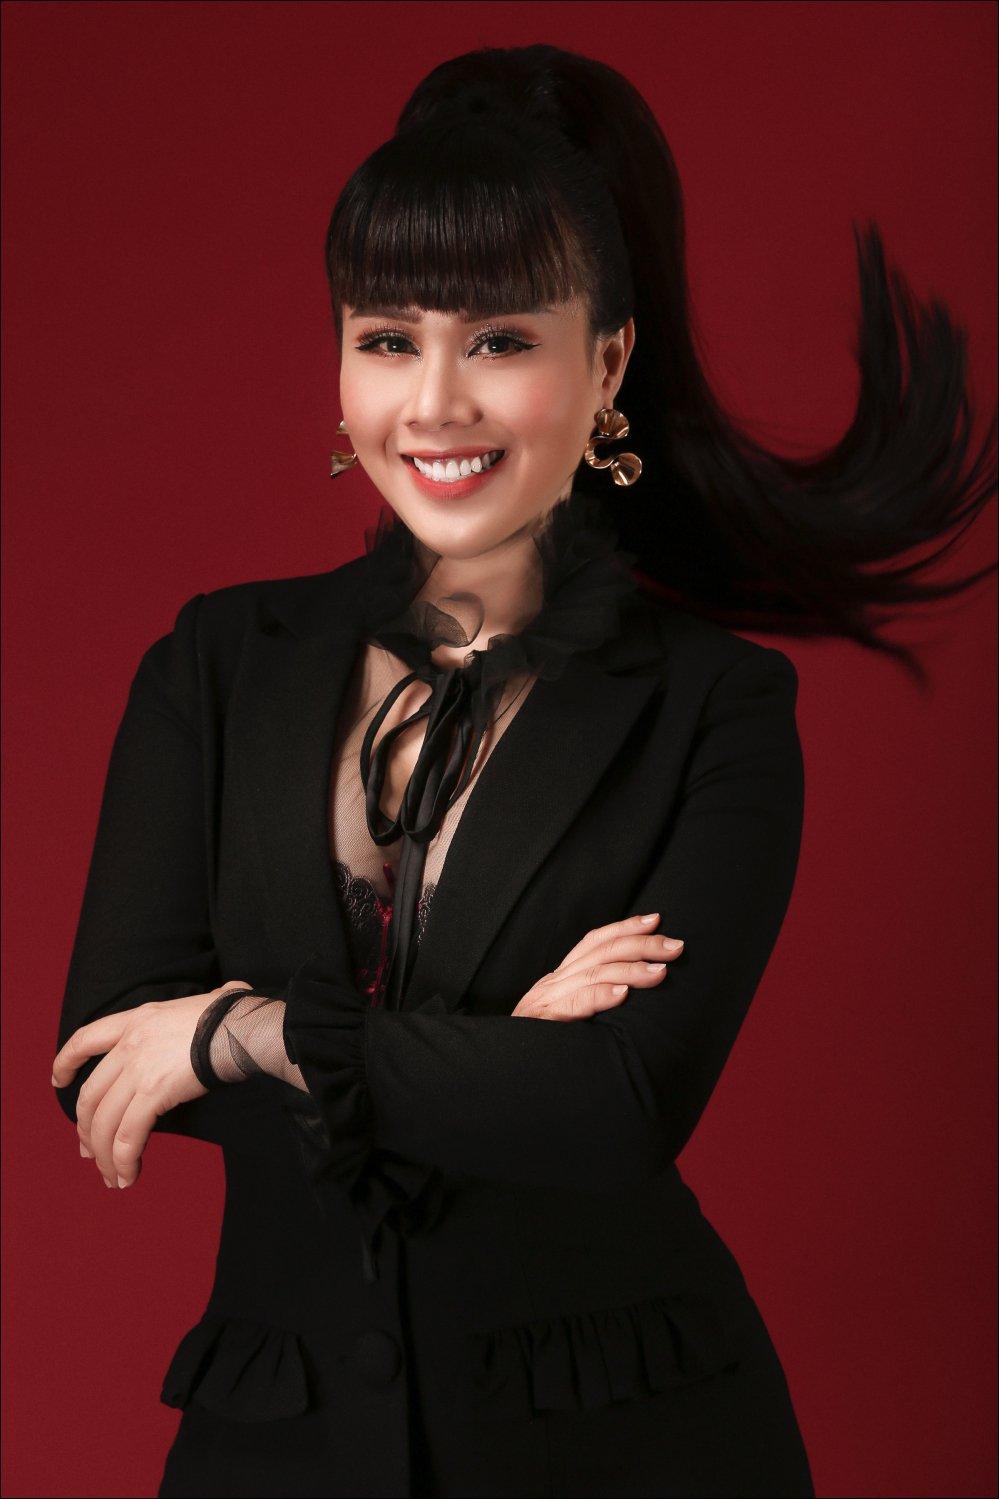 Hoa hau Hang Nguyen cung Juun Dang Dung dua vai lanh My A tro lai san dien hinh anh 2